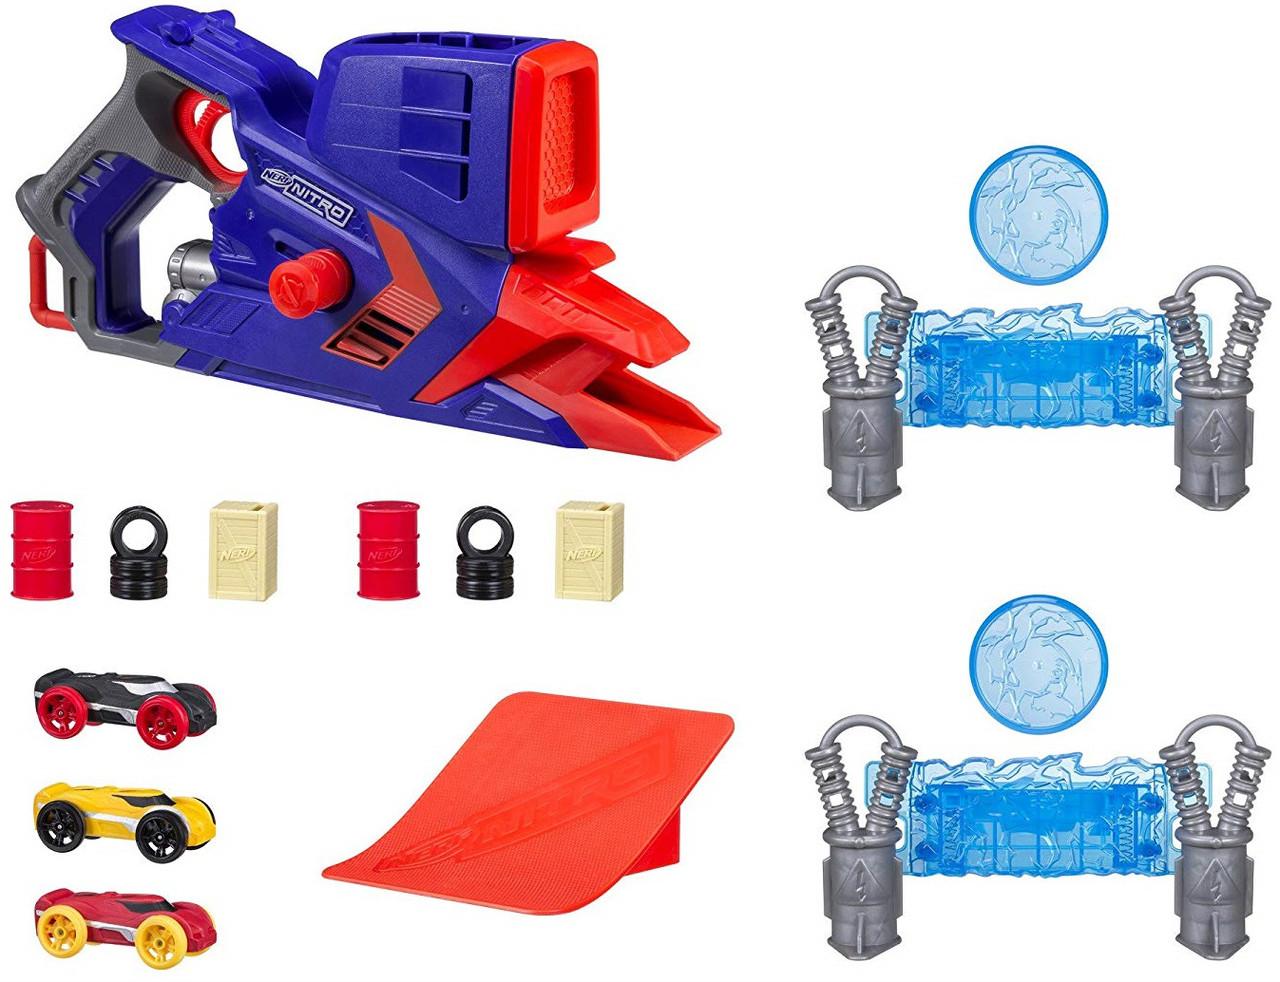 Набор Бластер Нёрф стреляет машинками, Nerf Nitro FlashFury Chaos, Hasbro, Оригинал из США